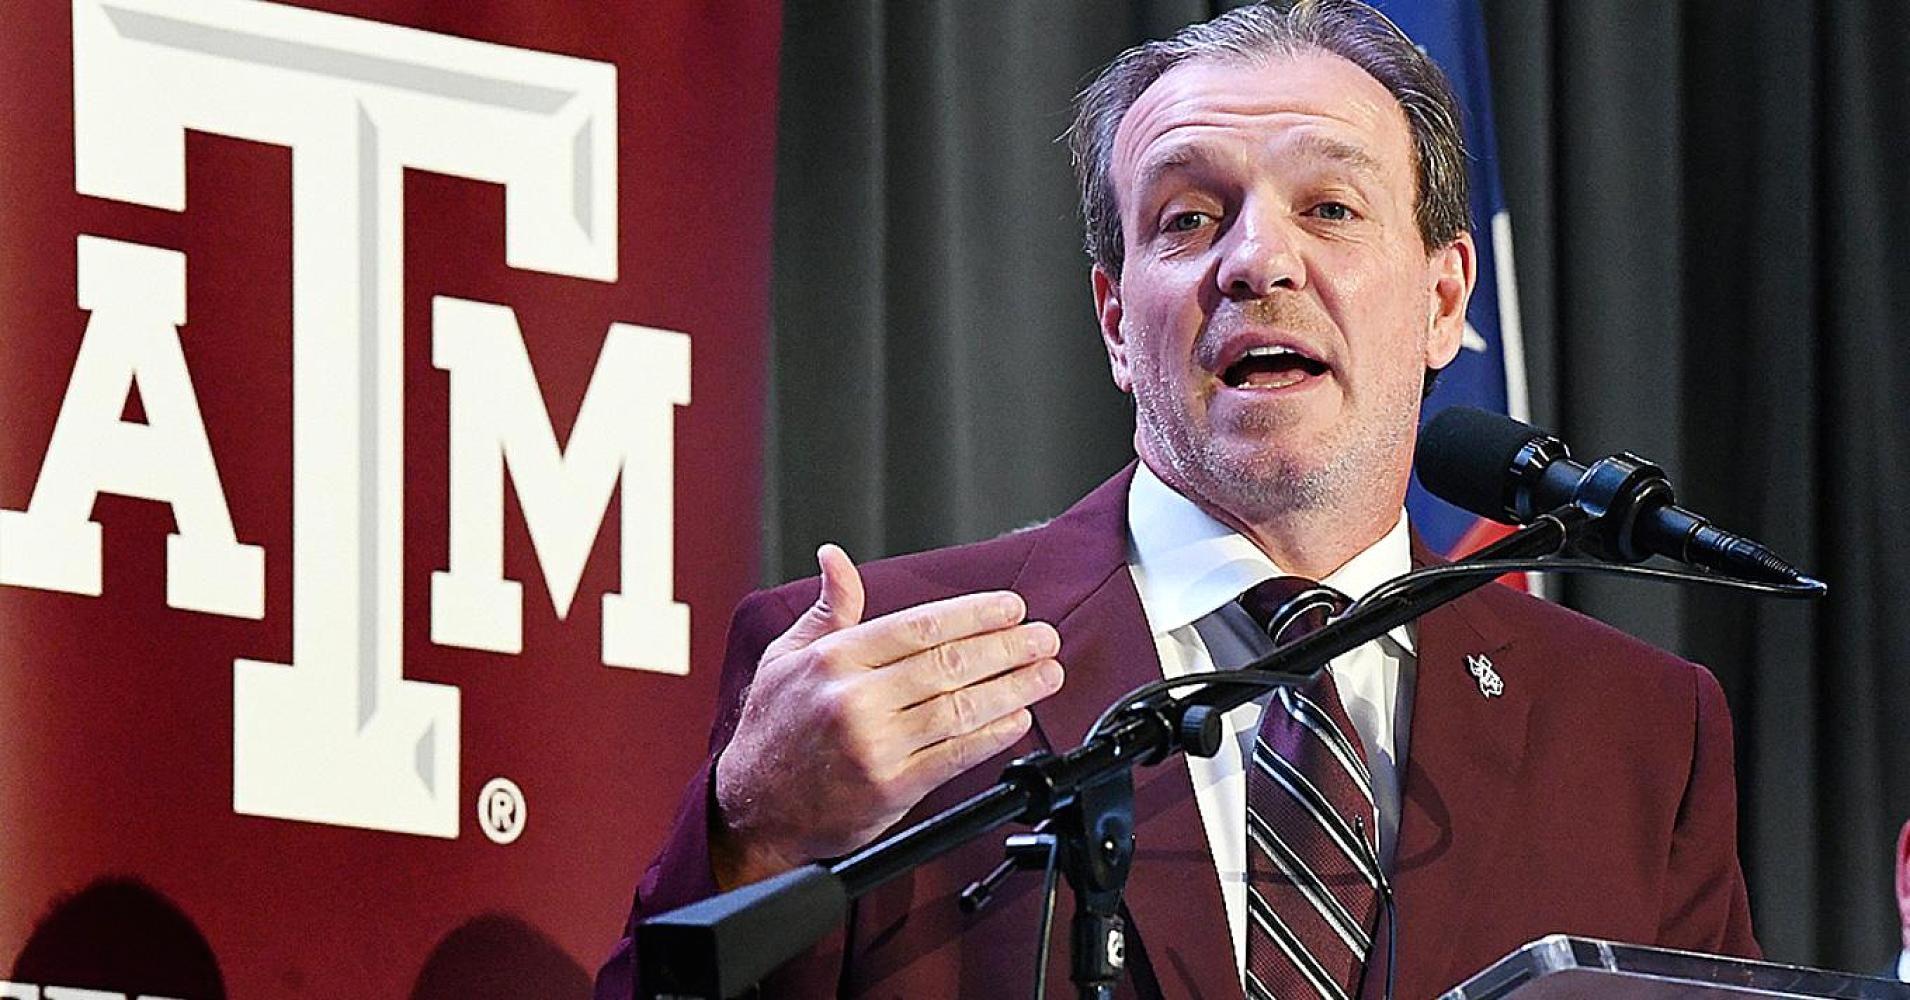 College or university coaches salaries increase despite